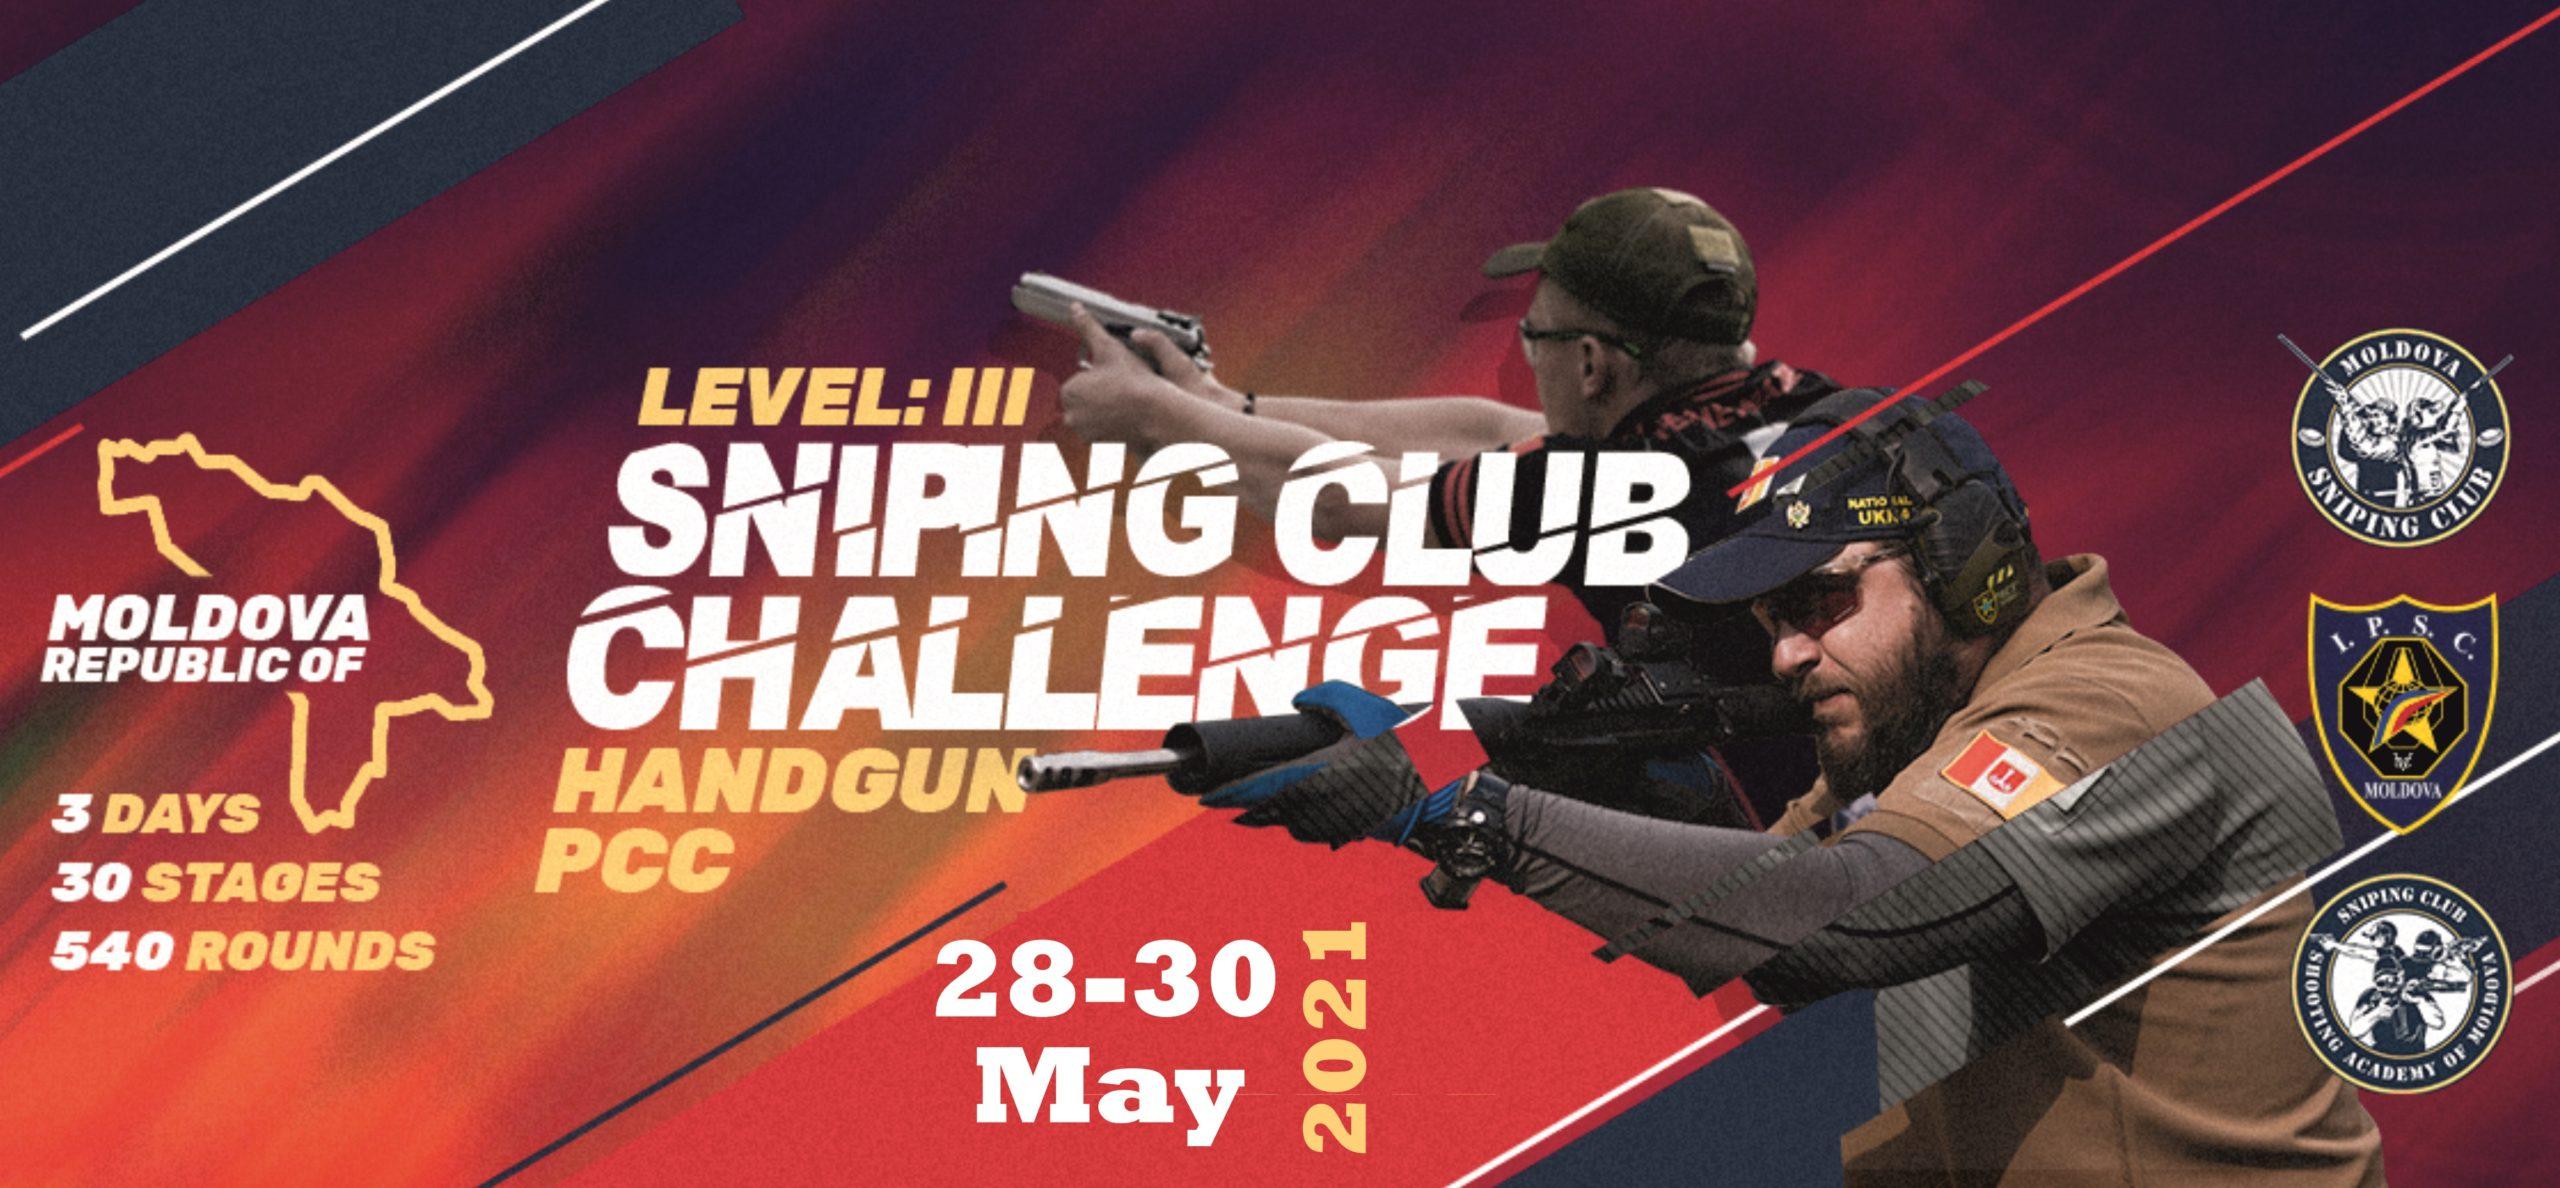 SnipingClub Challenge Handgun, PCC